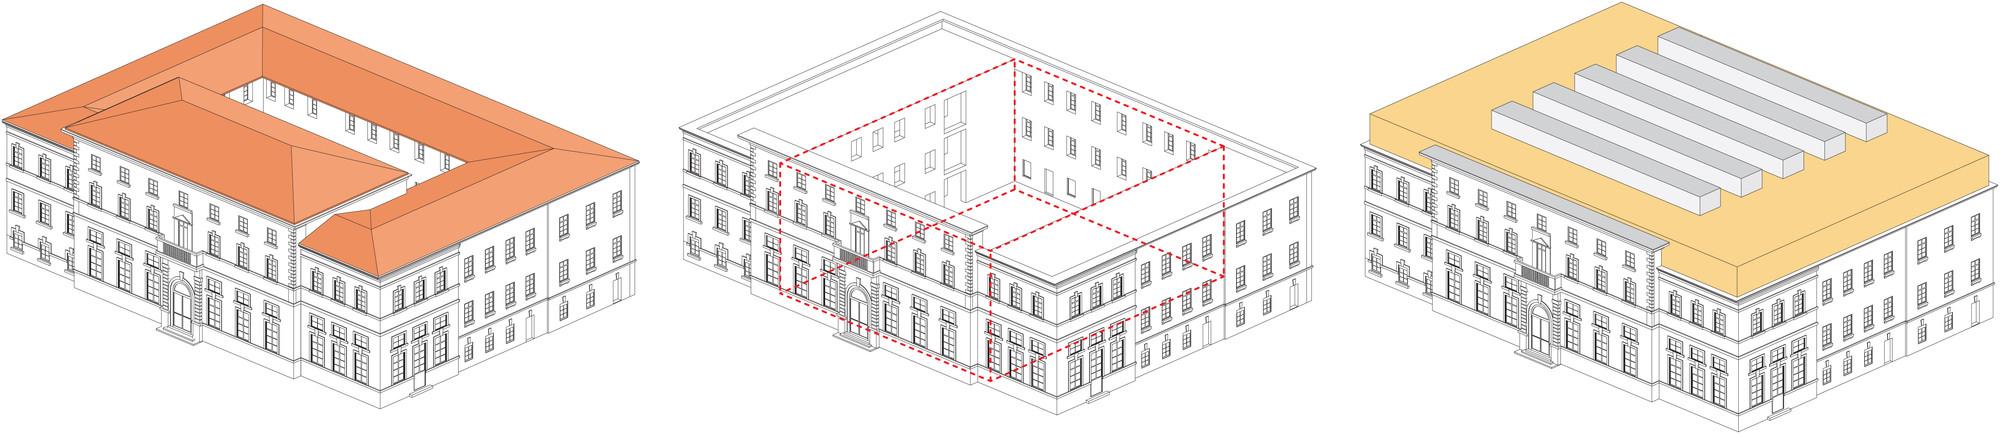 AZPA to Transform Nineteenth Century Building into Locarno Film Festival Headquarters